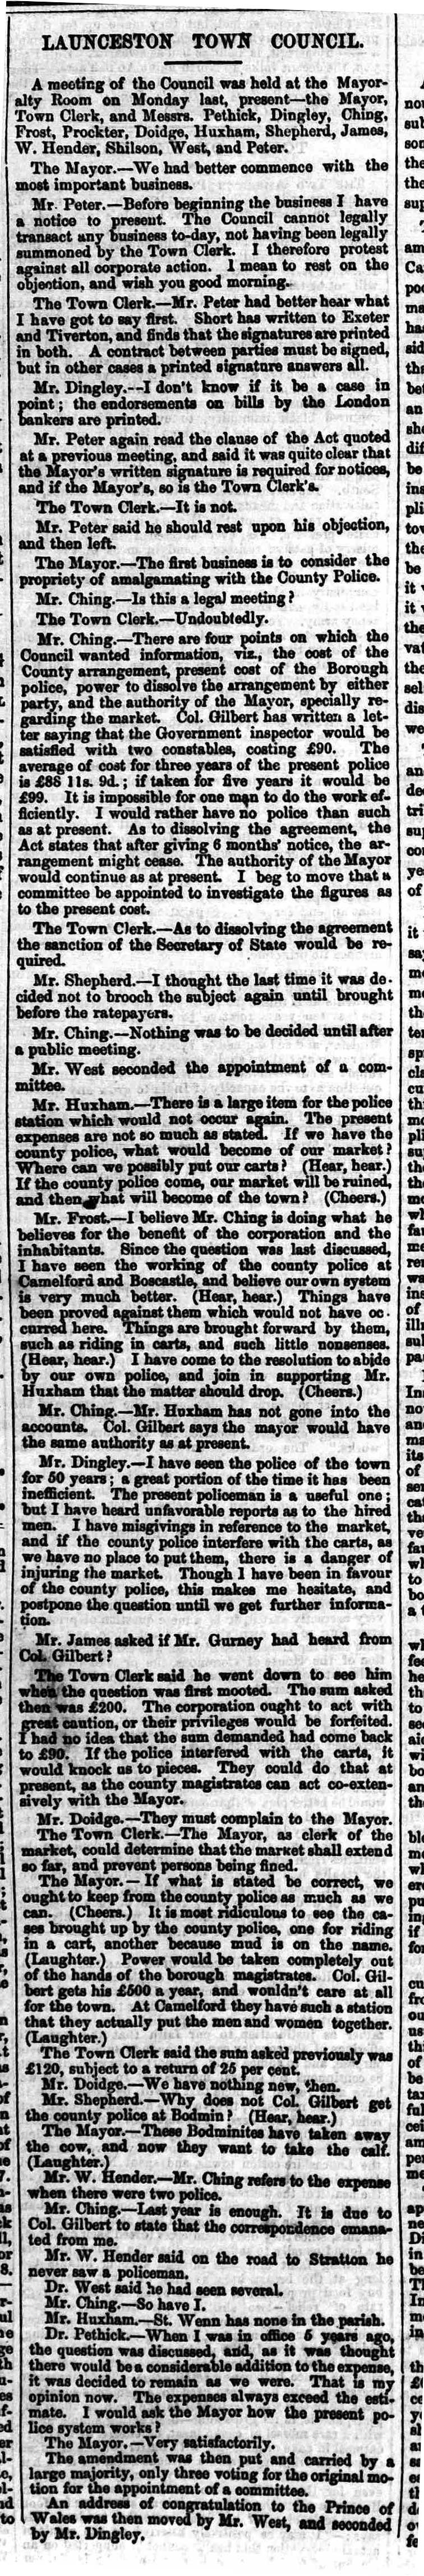 24 January 1863